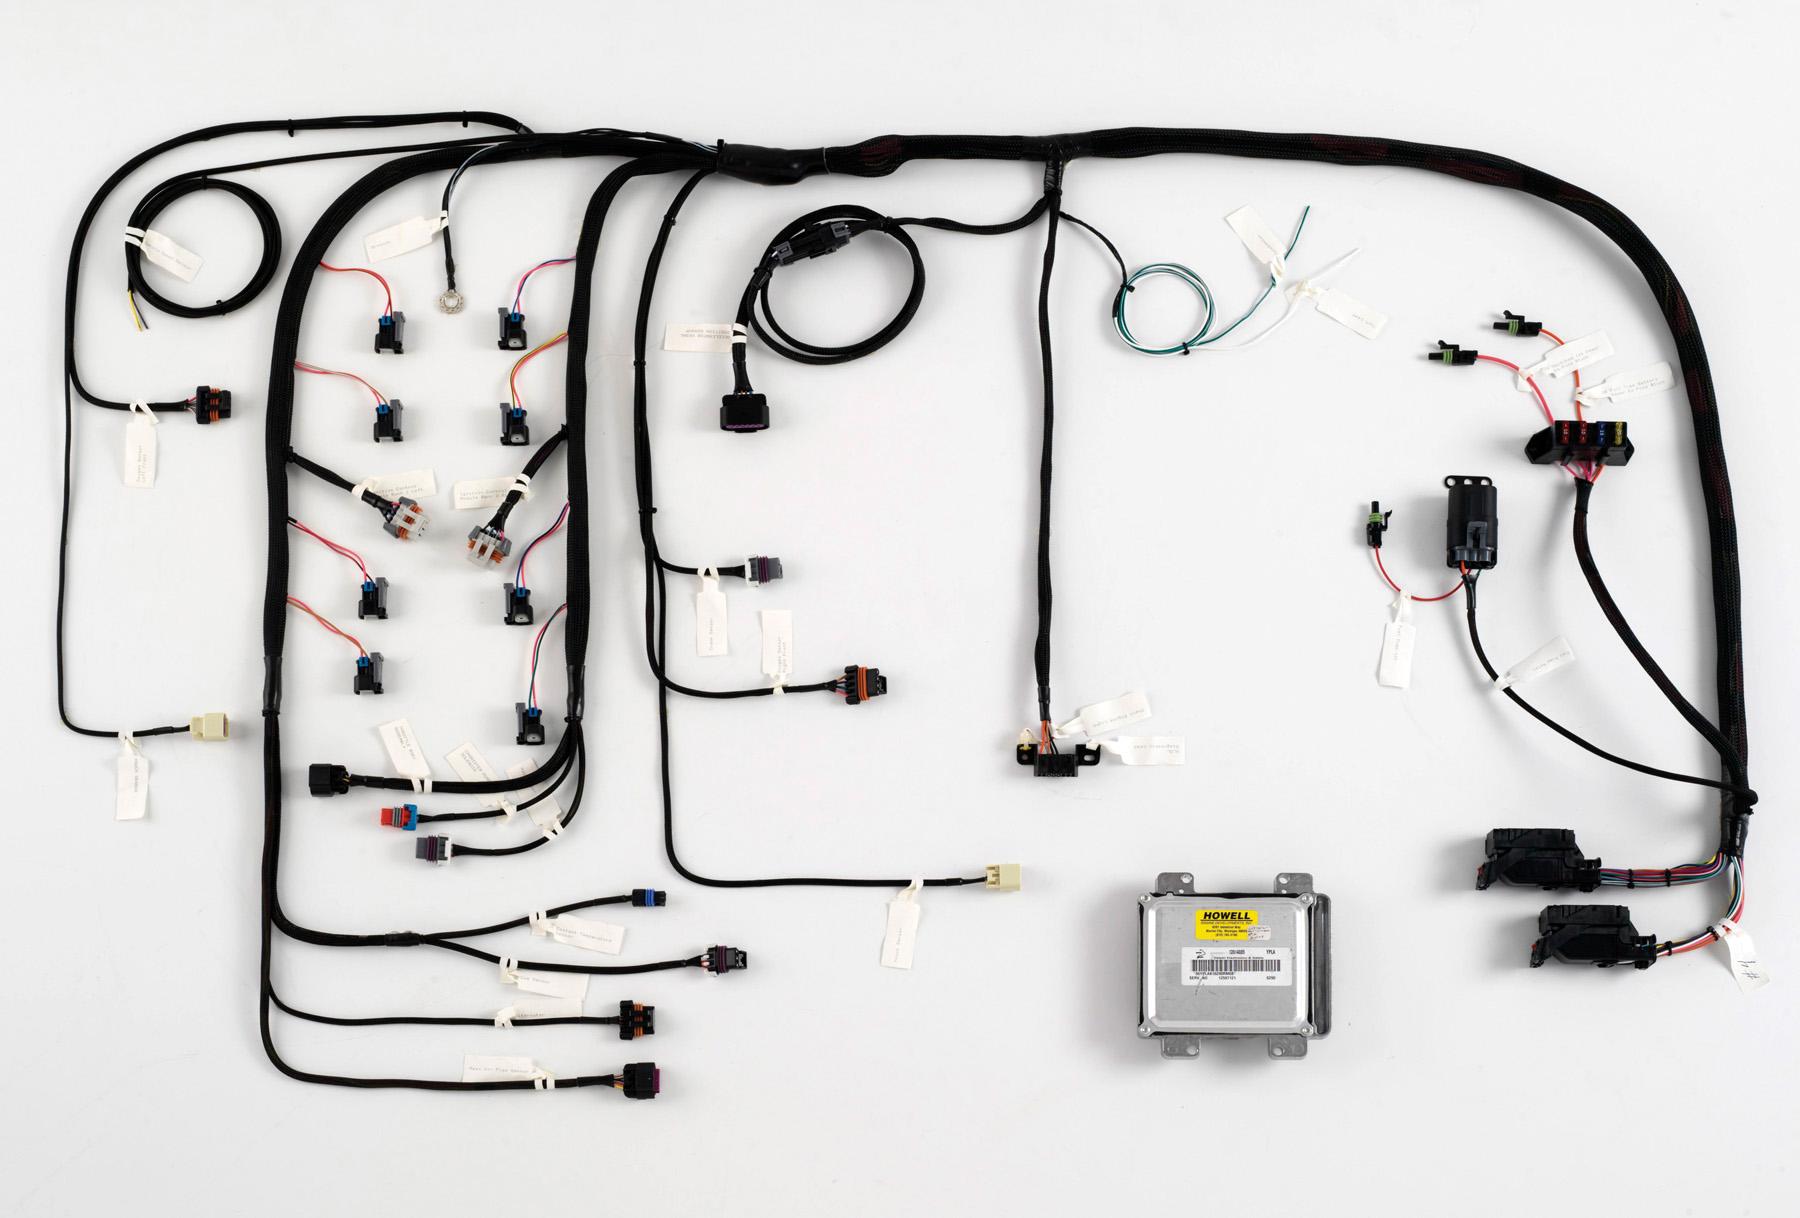 Howell 4l80e Wiring Harness - 13.qmx.paulking.nl • on 4l80e speed sensor diagram, 4l80e neutral safety switch diagram, 4l80e electrical diagram, 4l80e solenoid diagram, 4l60e transmission exploded view diagram, 4l60e automatic transmission parts diagram, 4l80e transmission diagram, 4l80e pump diagram,